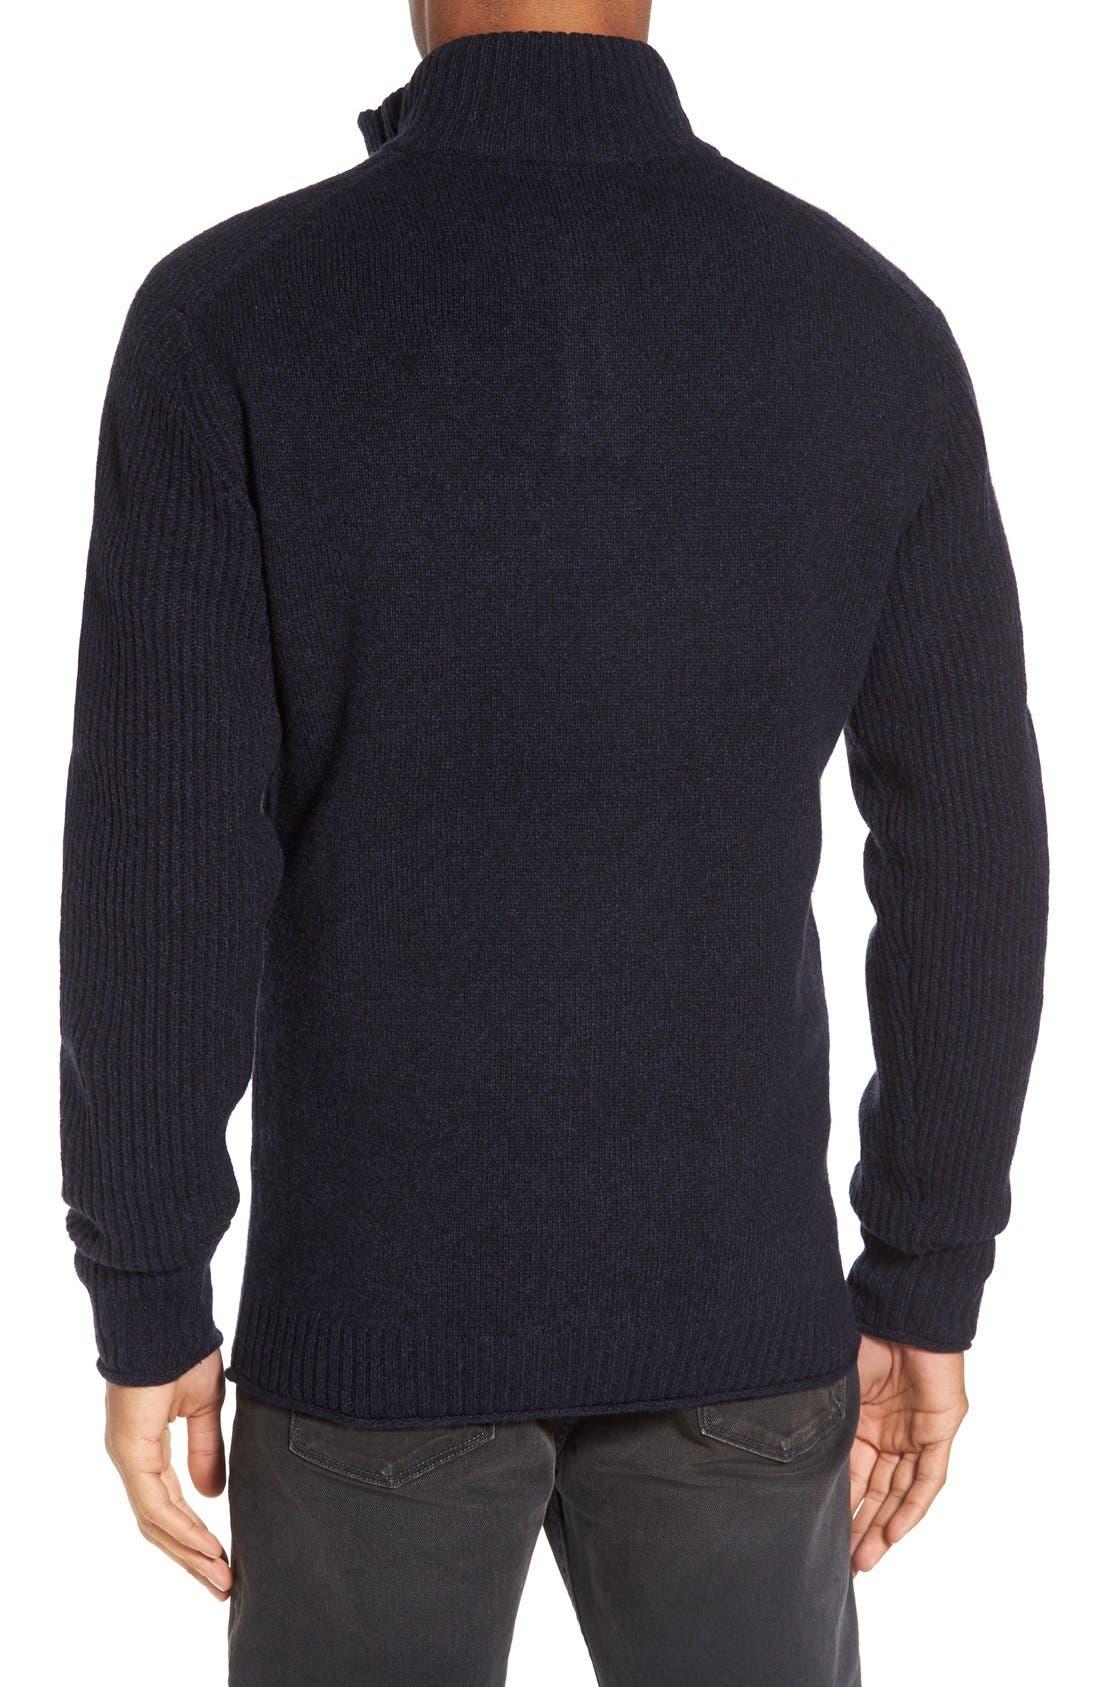 Alternate Image 2  - Rodd & Gunn Birkenhead Mock Neck Sweater